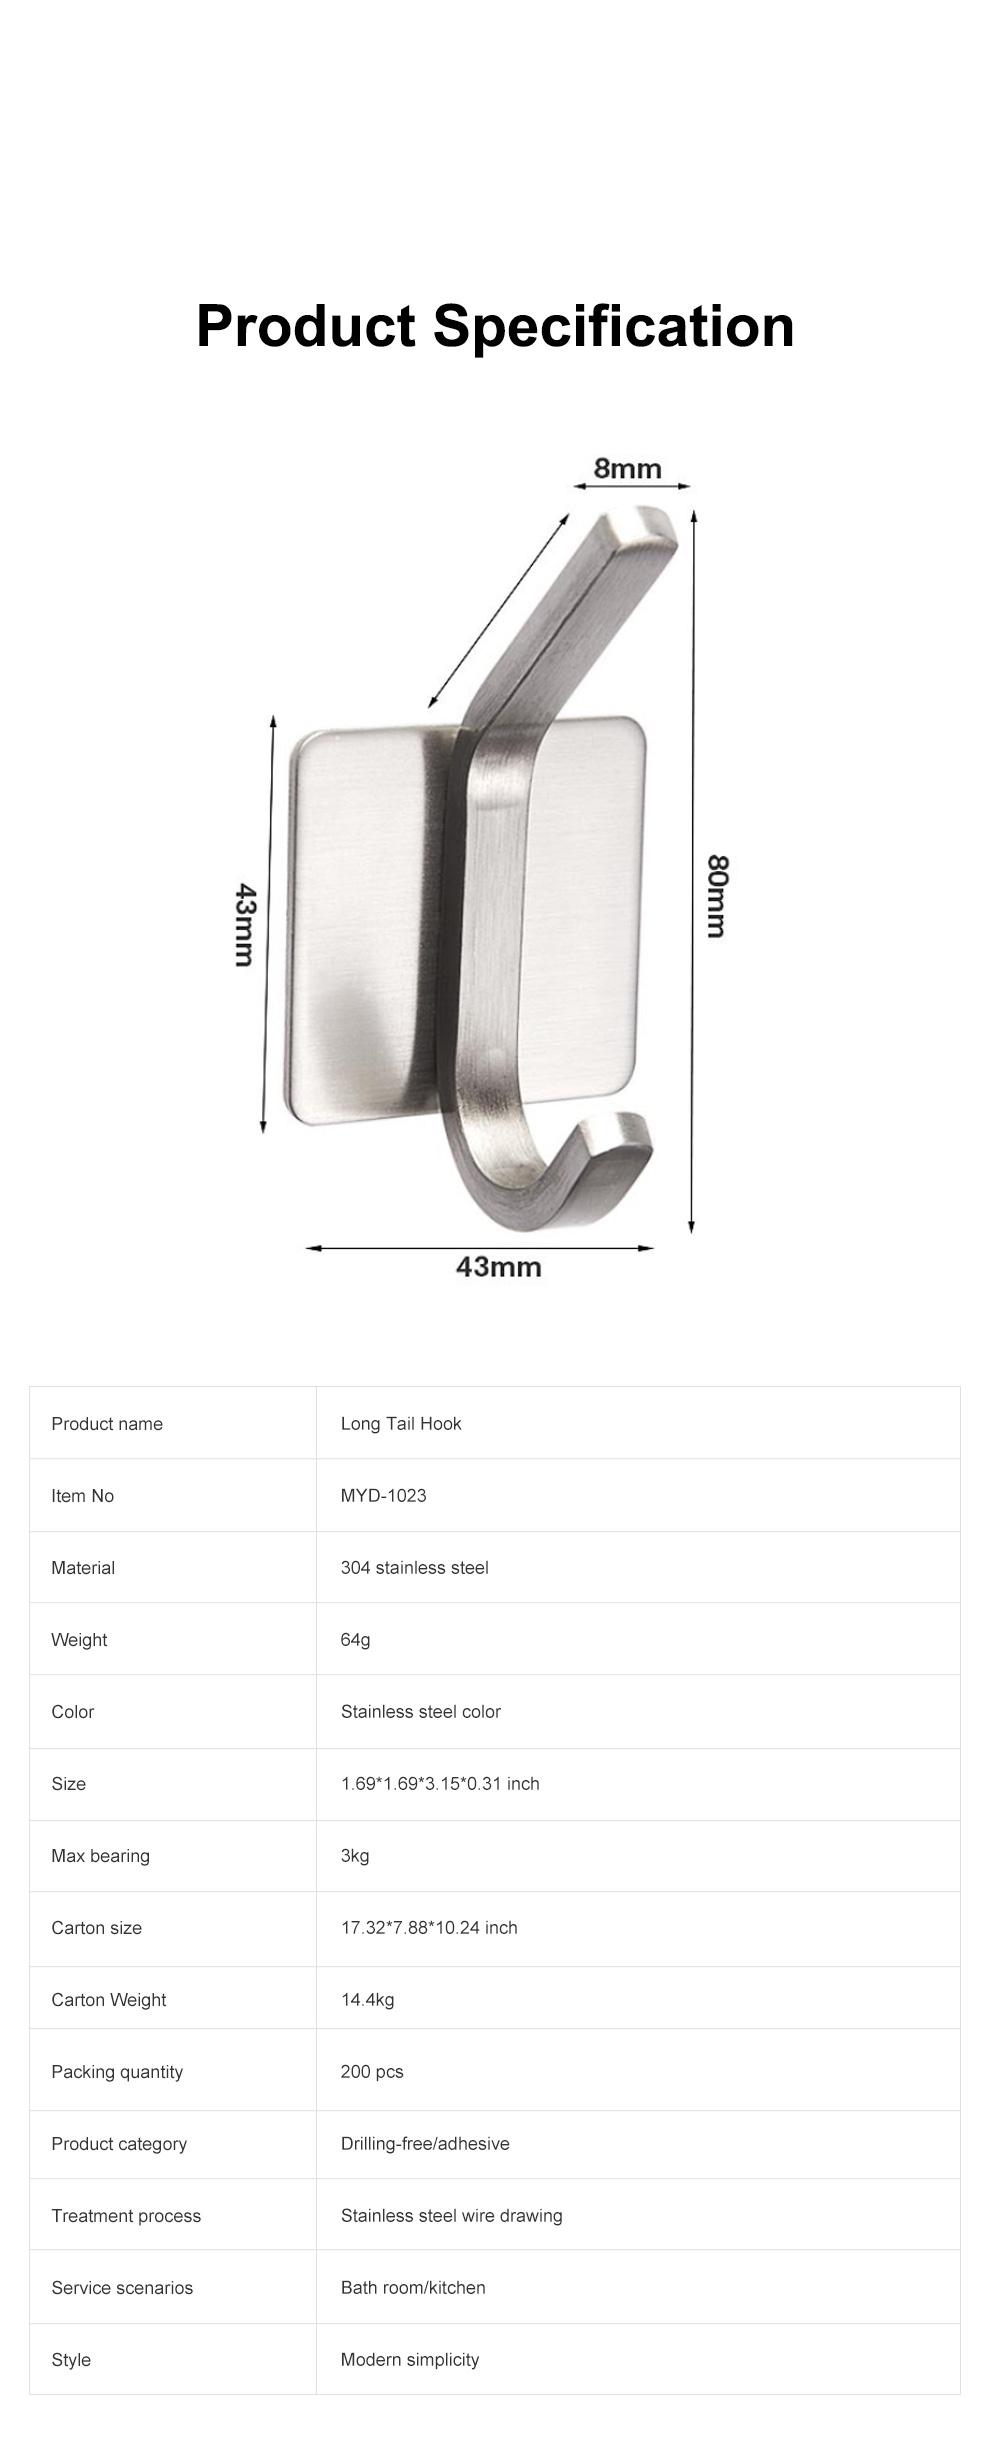 3M Glue Long Tail Hooks for Kitchen Bathroom Bedroom Hanging Waterproof 304 Stainless Steel Wall Hooks 7